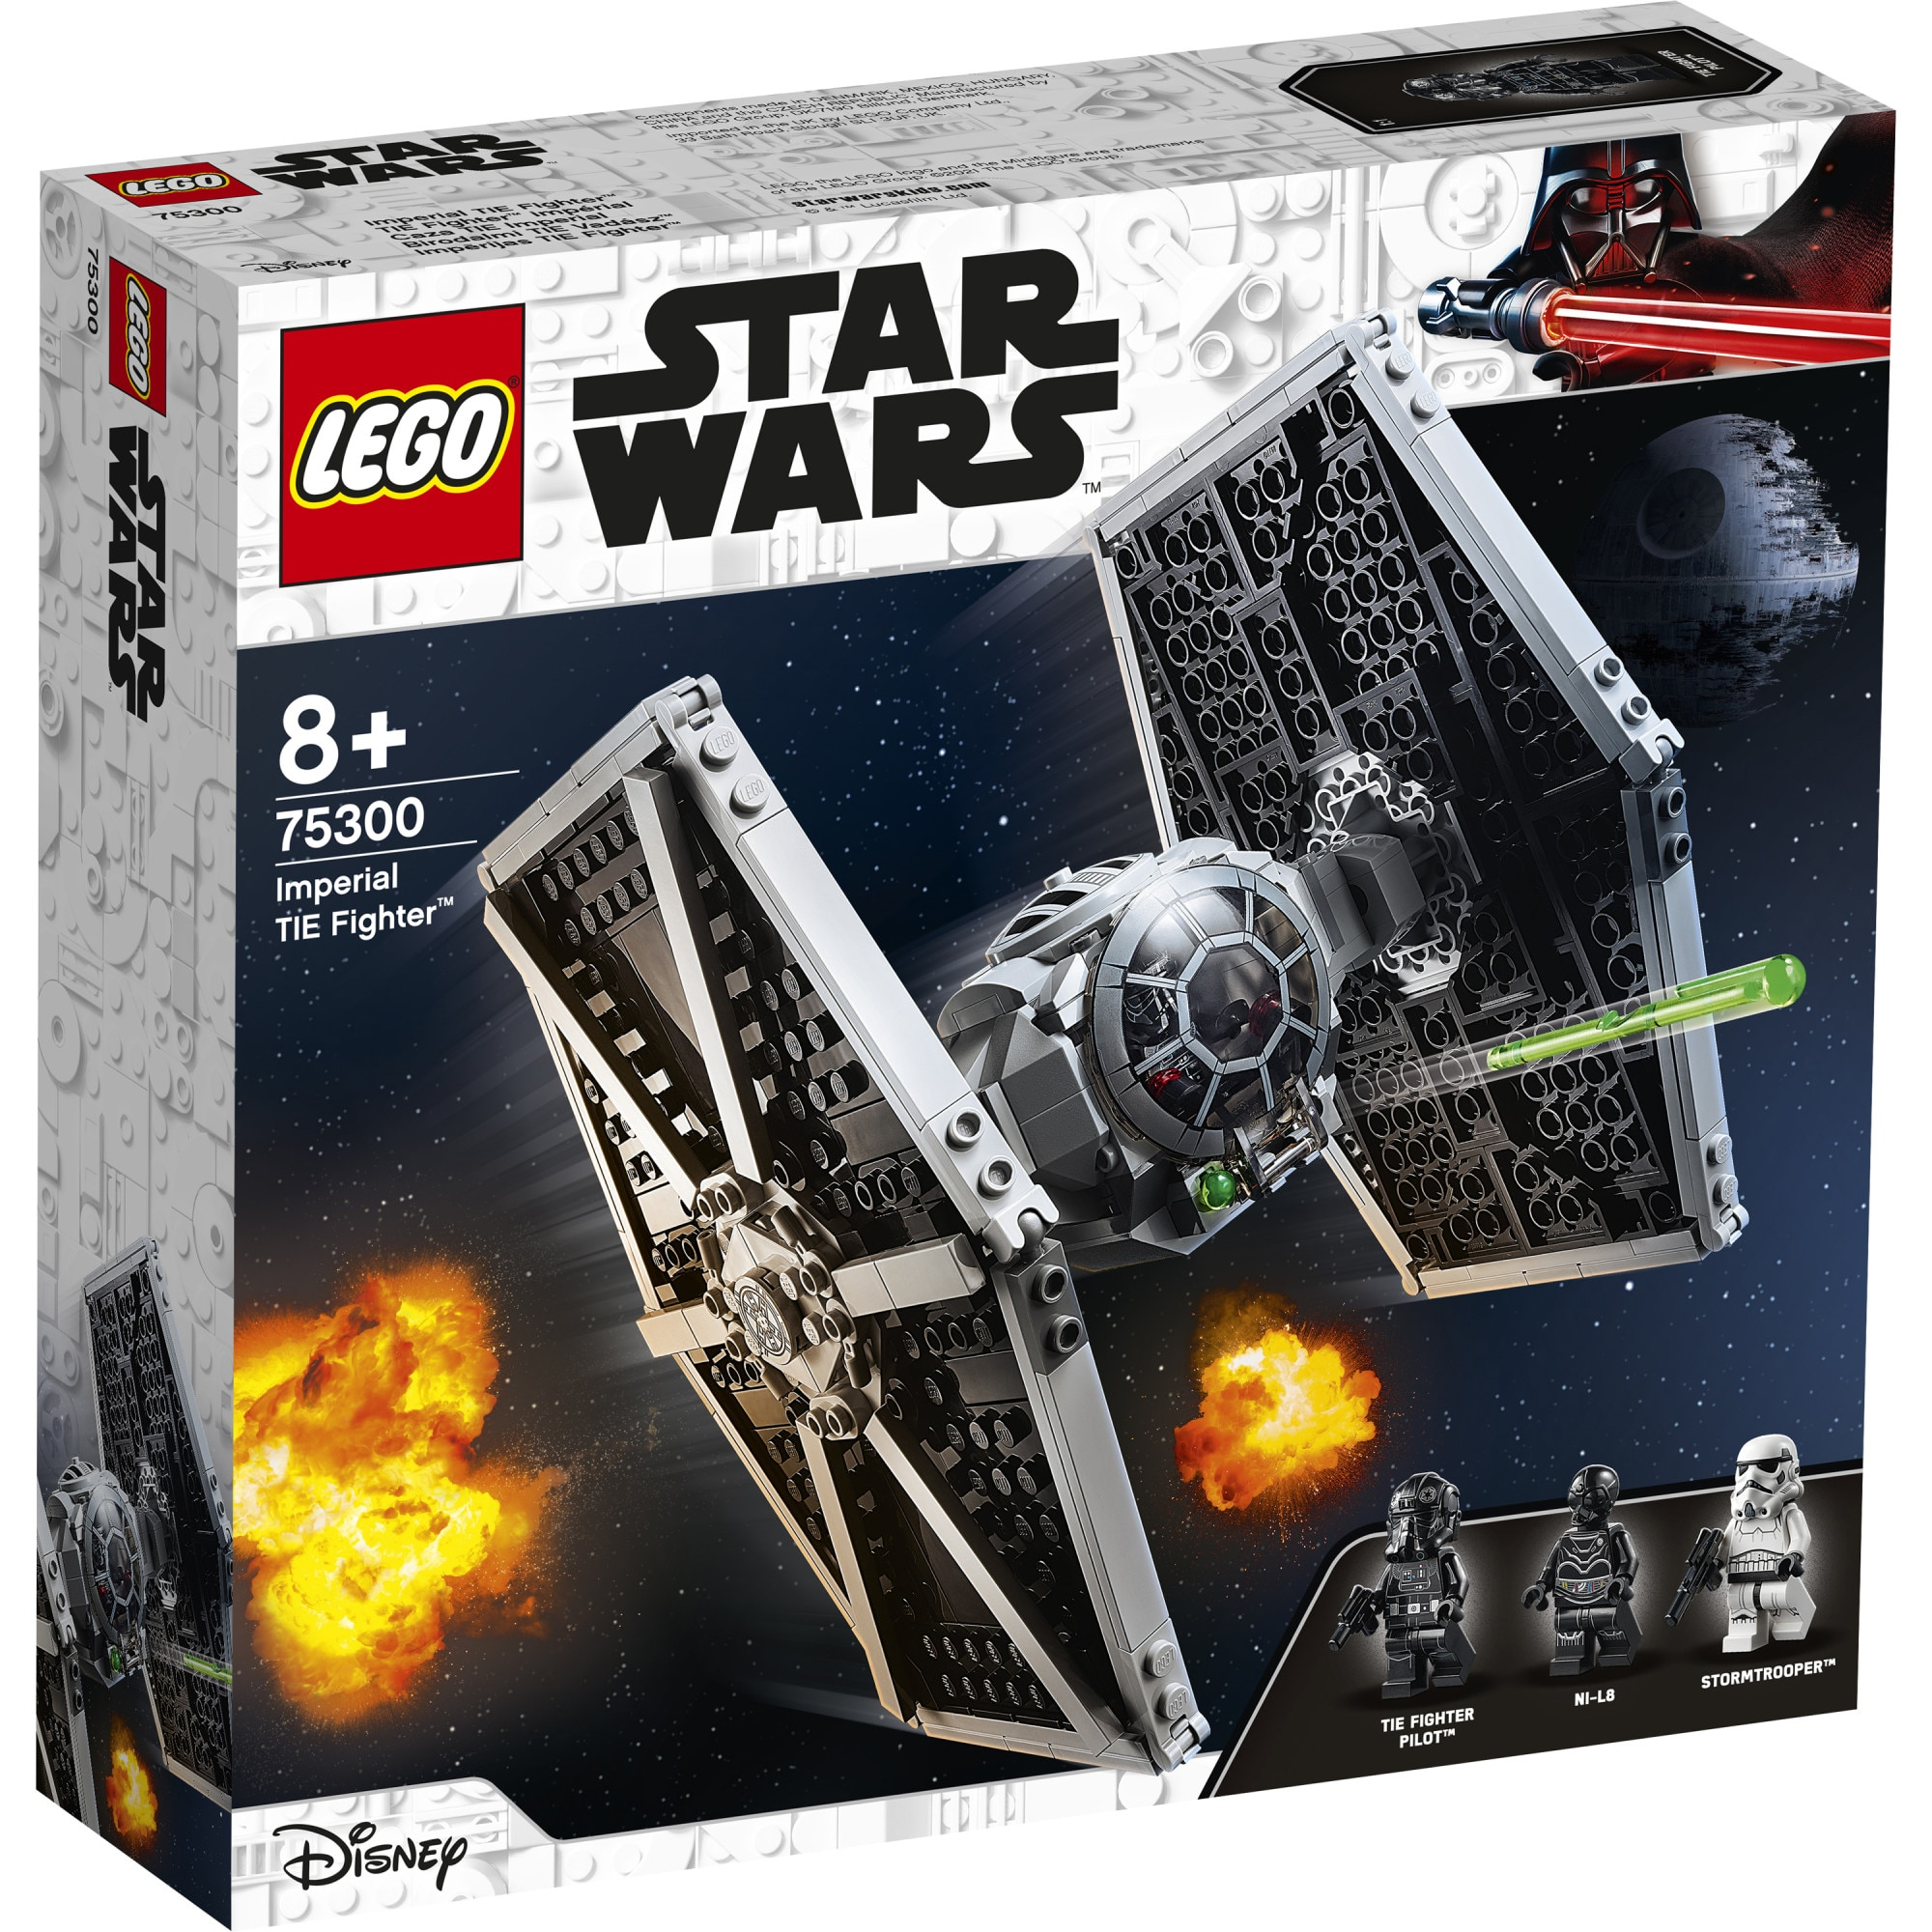 Fotografie LEGO Star Wars - Imperial TIE Fighter 75300, 432 piese